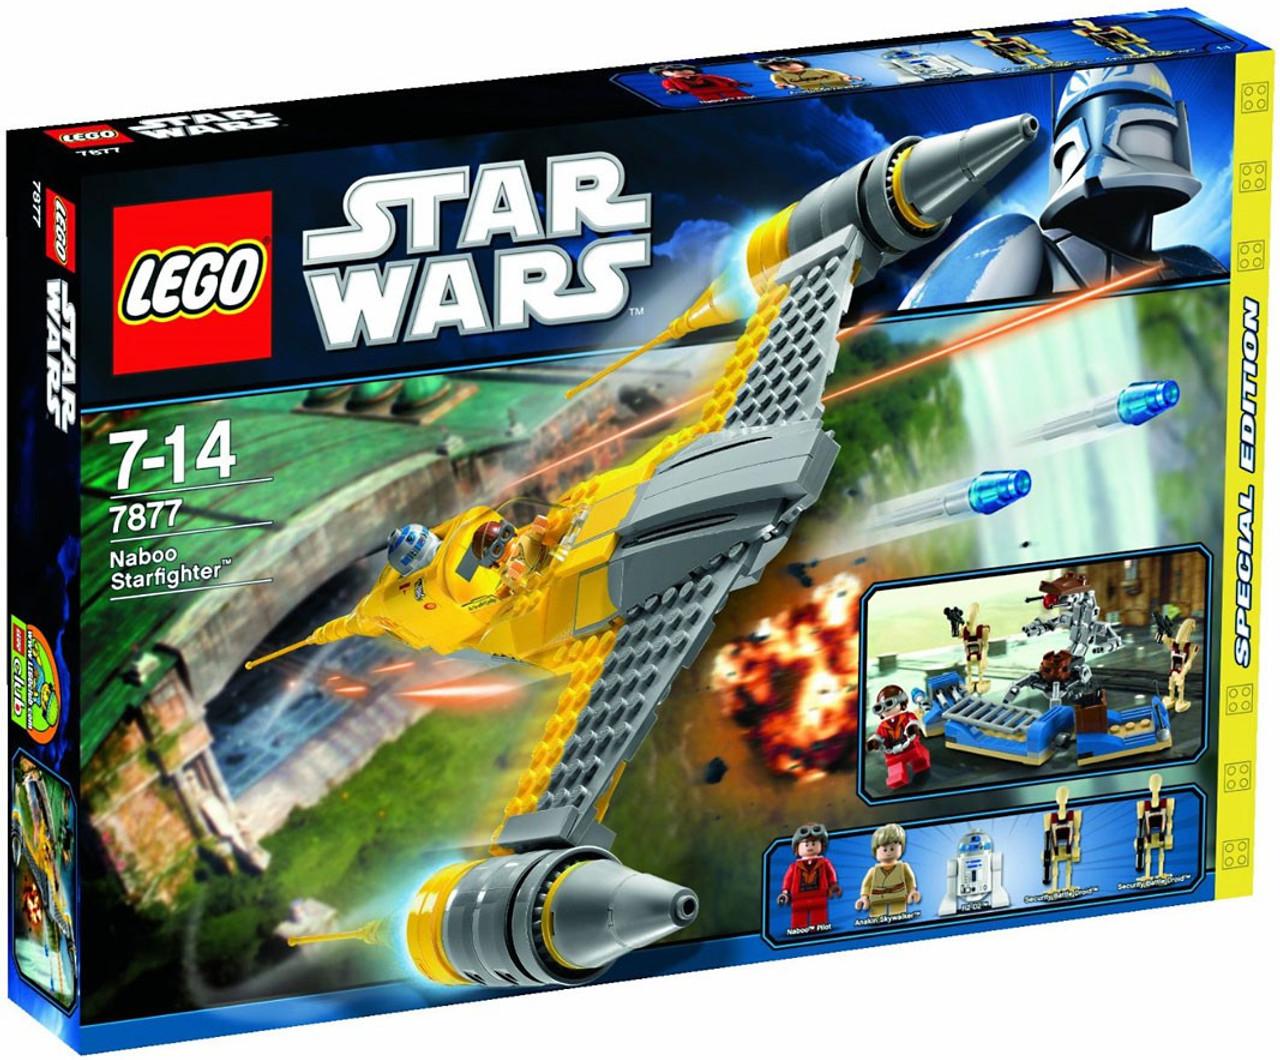 LEGO Star Wars The Phantom Menace Naboo Starfighter Exclusive Set #7877